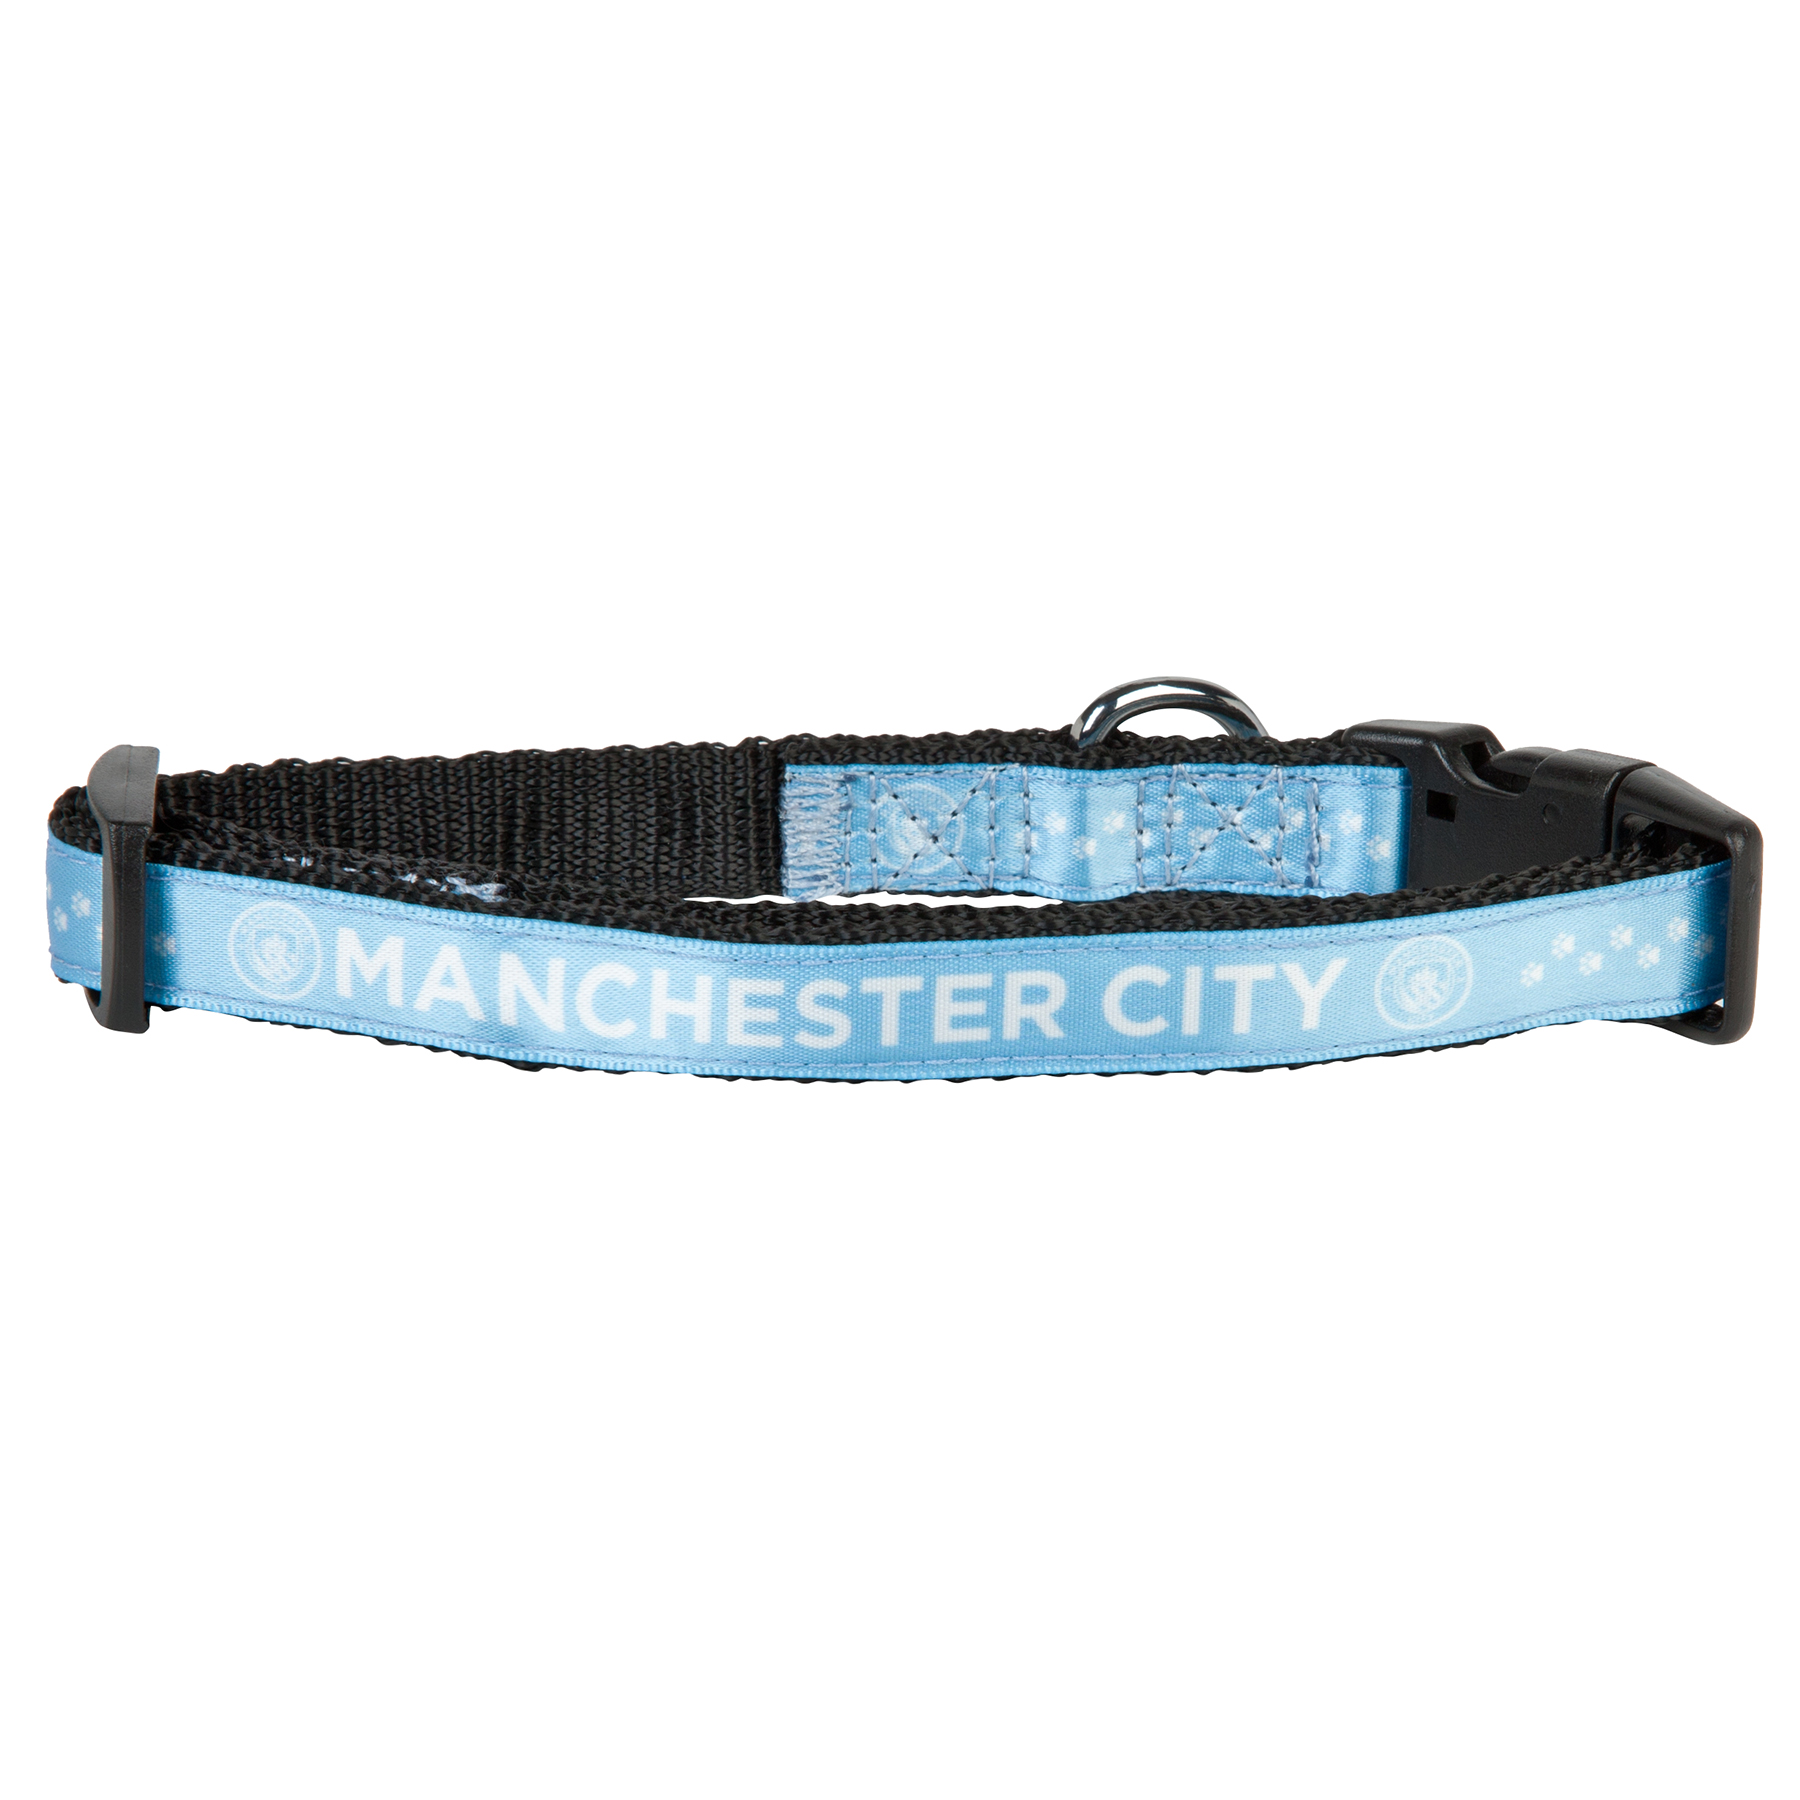 Manchester City Dog Collar - Medium